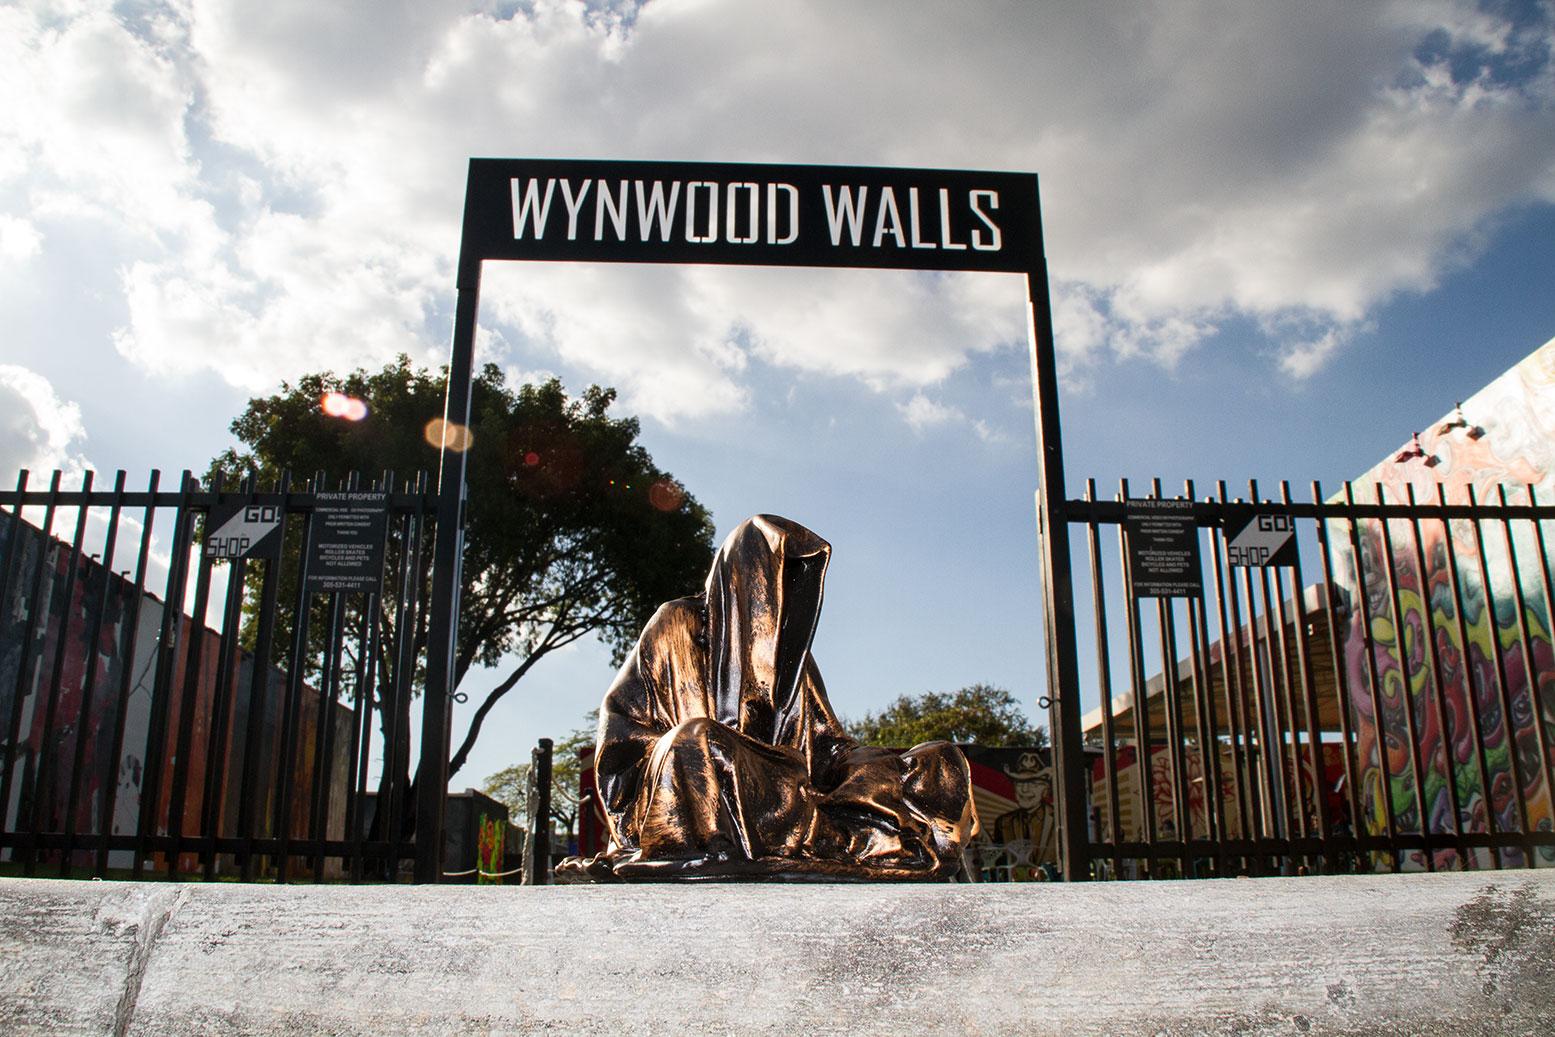 art-basel-miami-beach-fair-usa-florida-wynwood-guardians-of-time-manfred-kili-kielnhofer-contemporary-fine-art-modern-arts-design-antiques-sculpture-spectrum-miami-7585